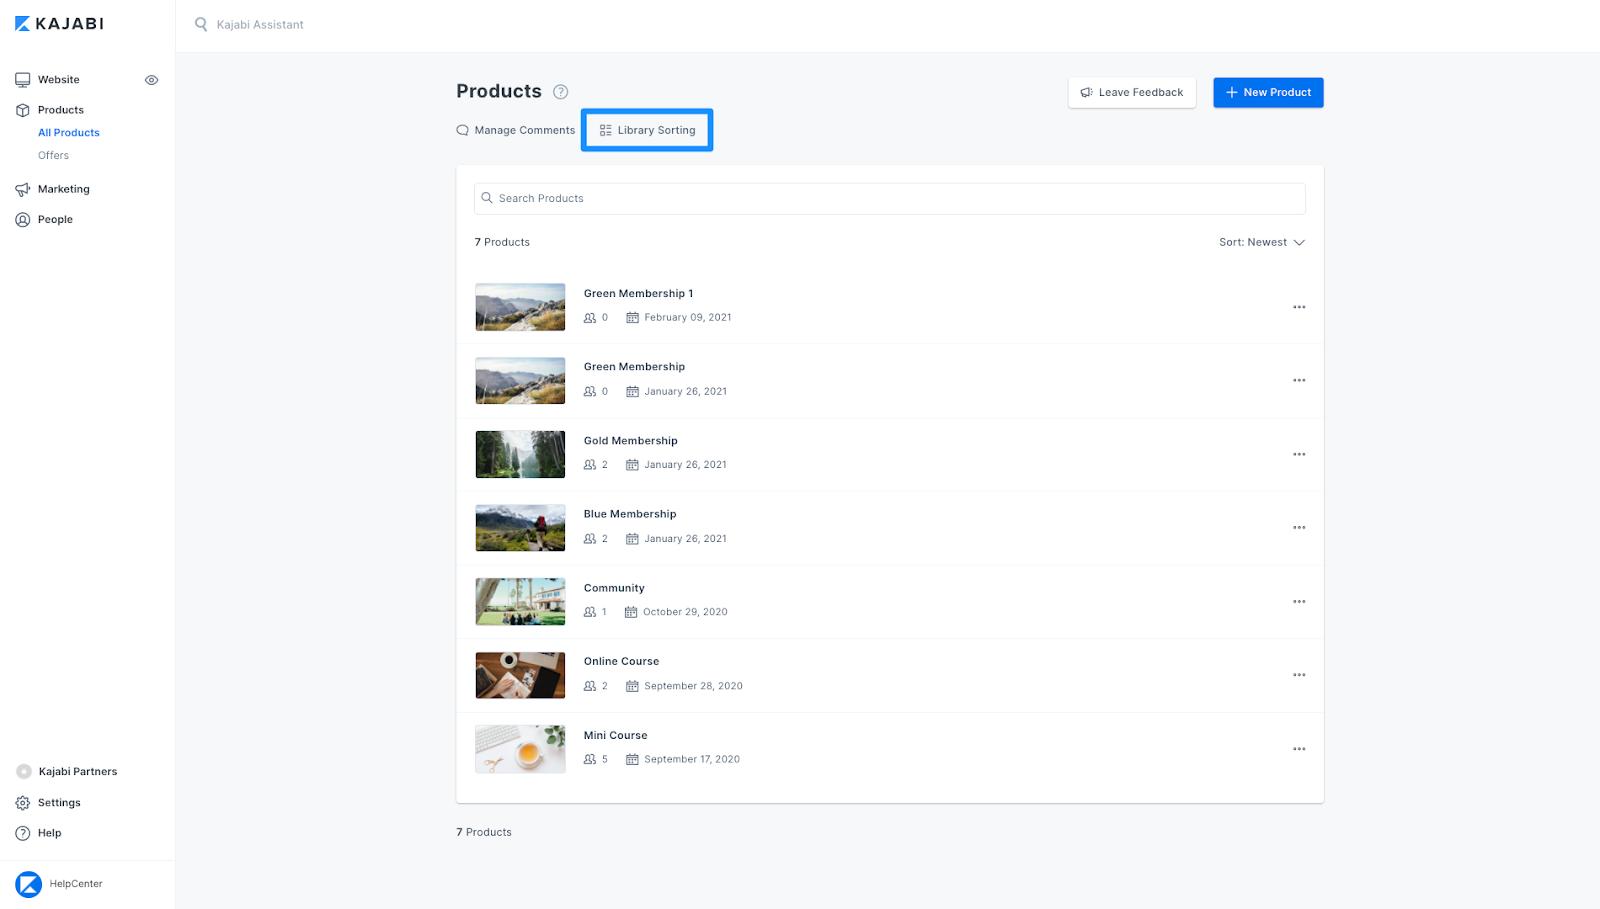 Screenshot of the Kajabi Labs Library Sorting product page